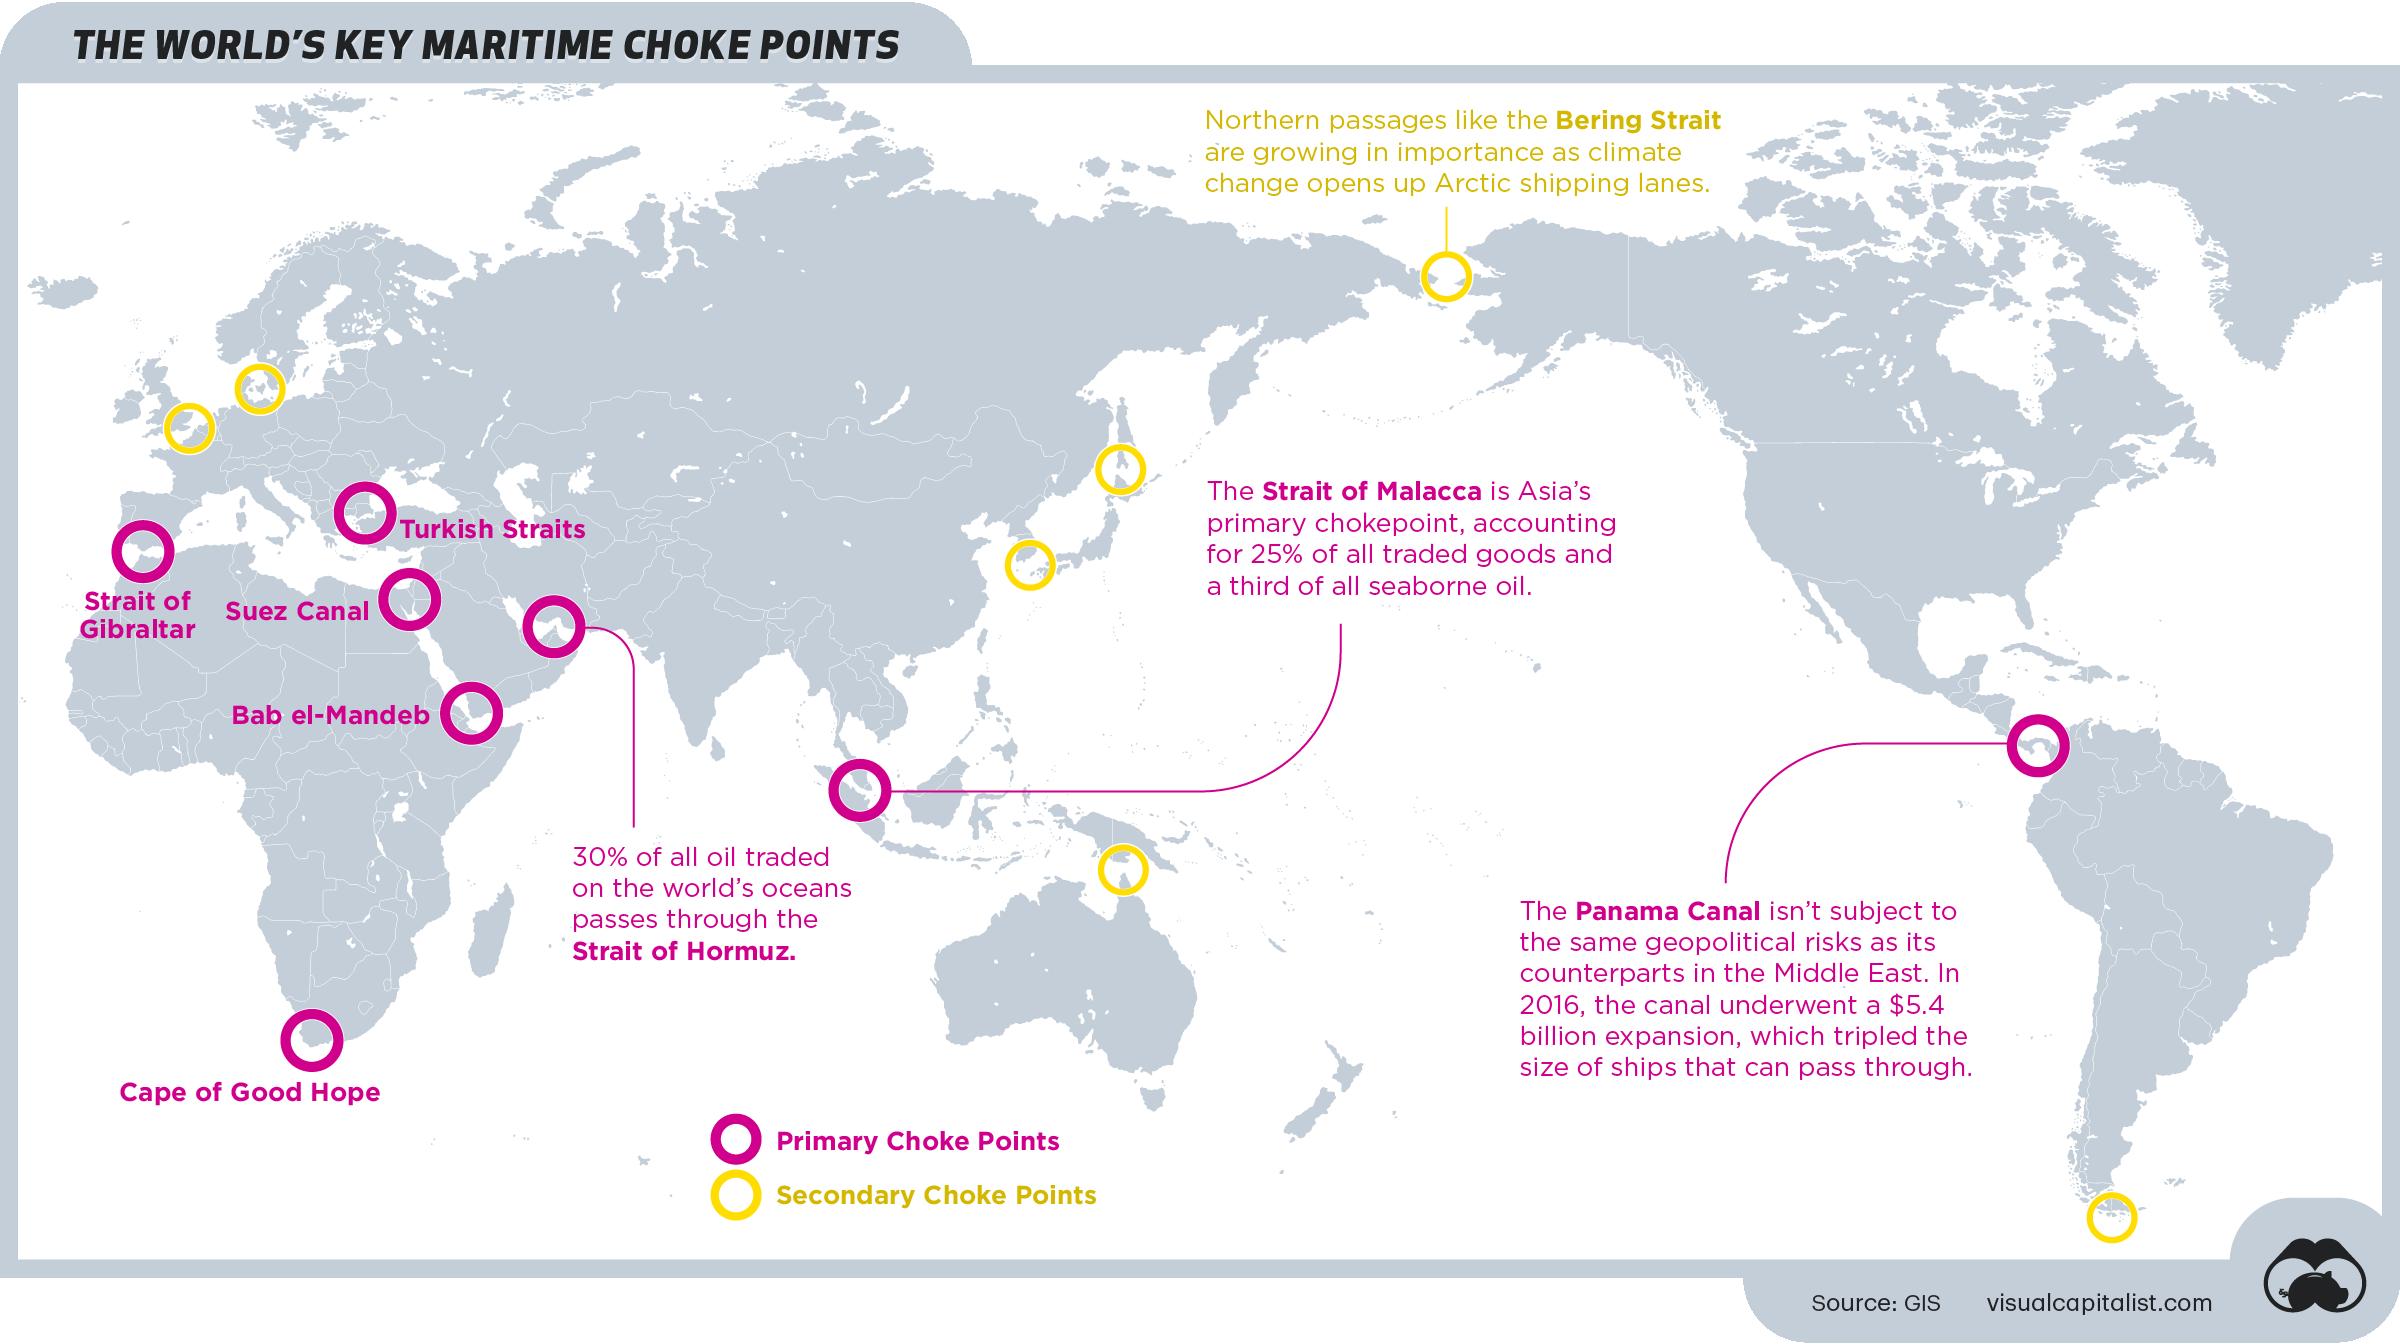 maritime choke points